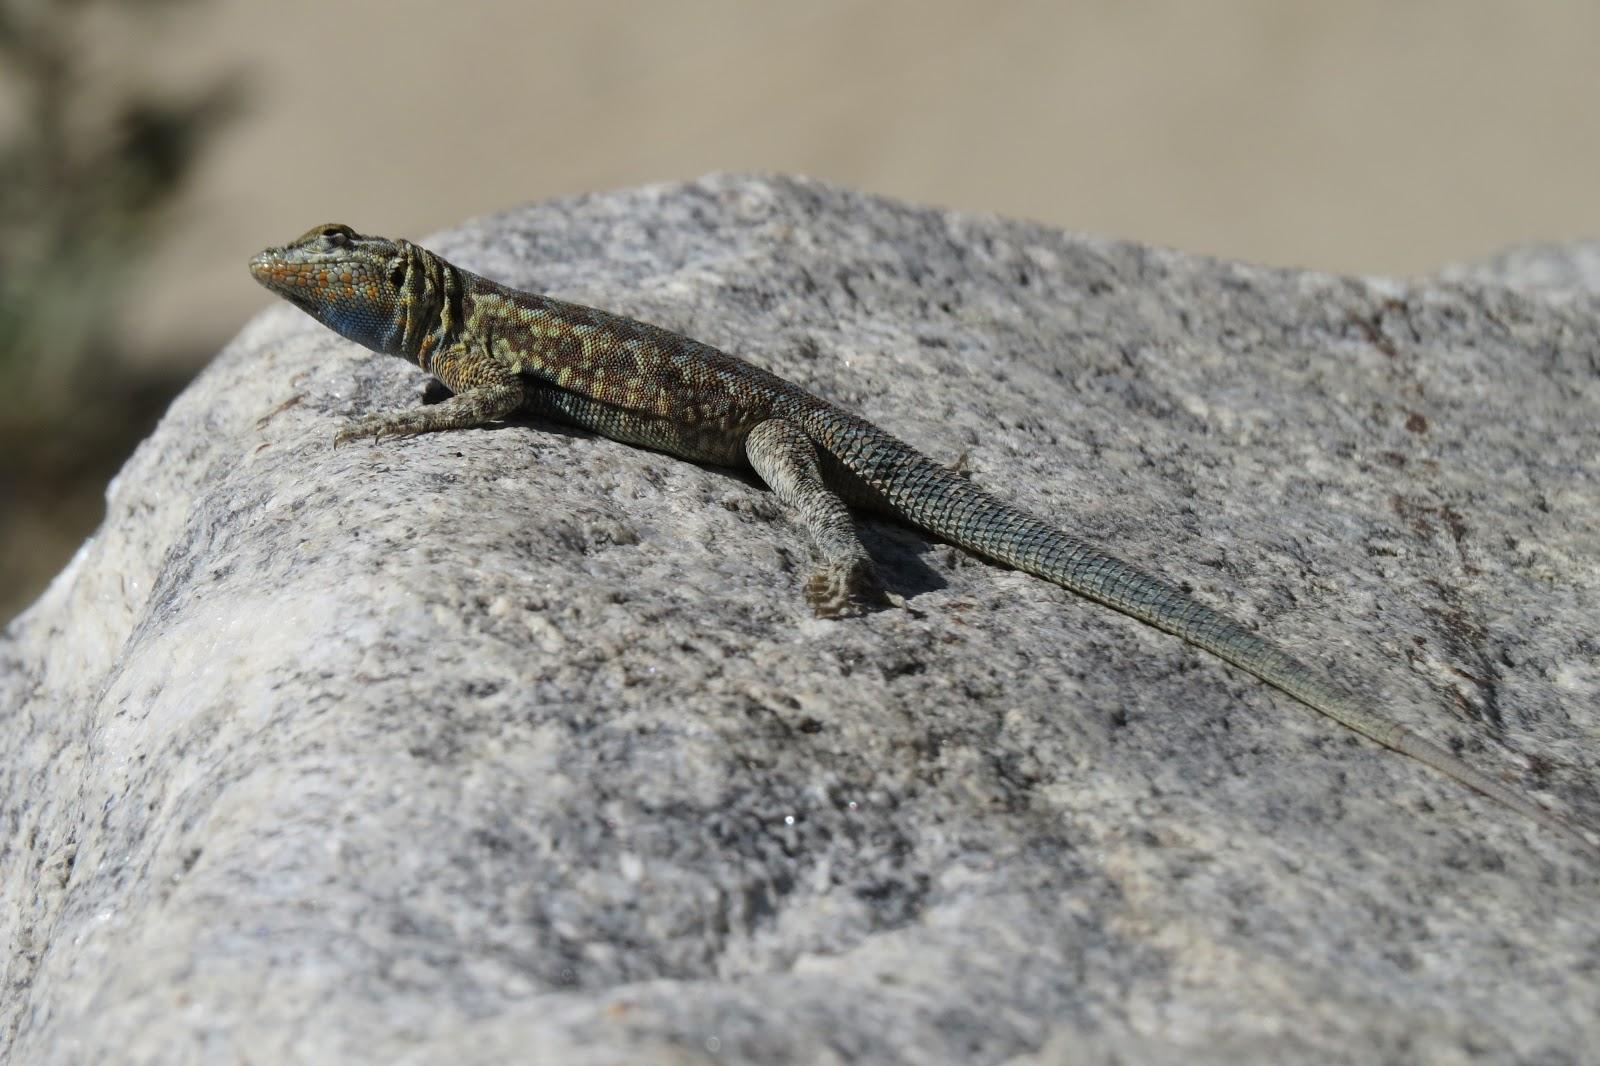 Indian Canyon lizard